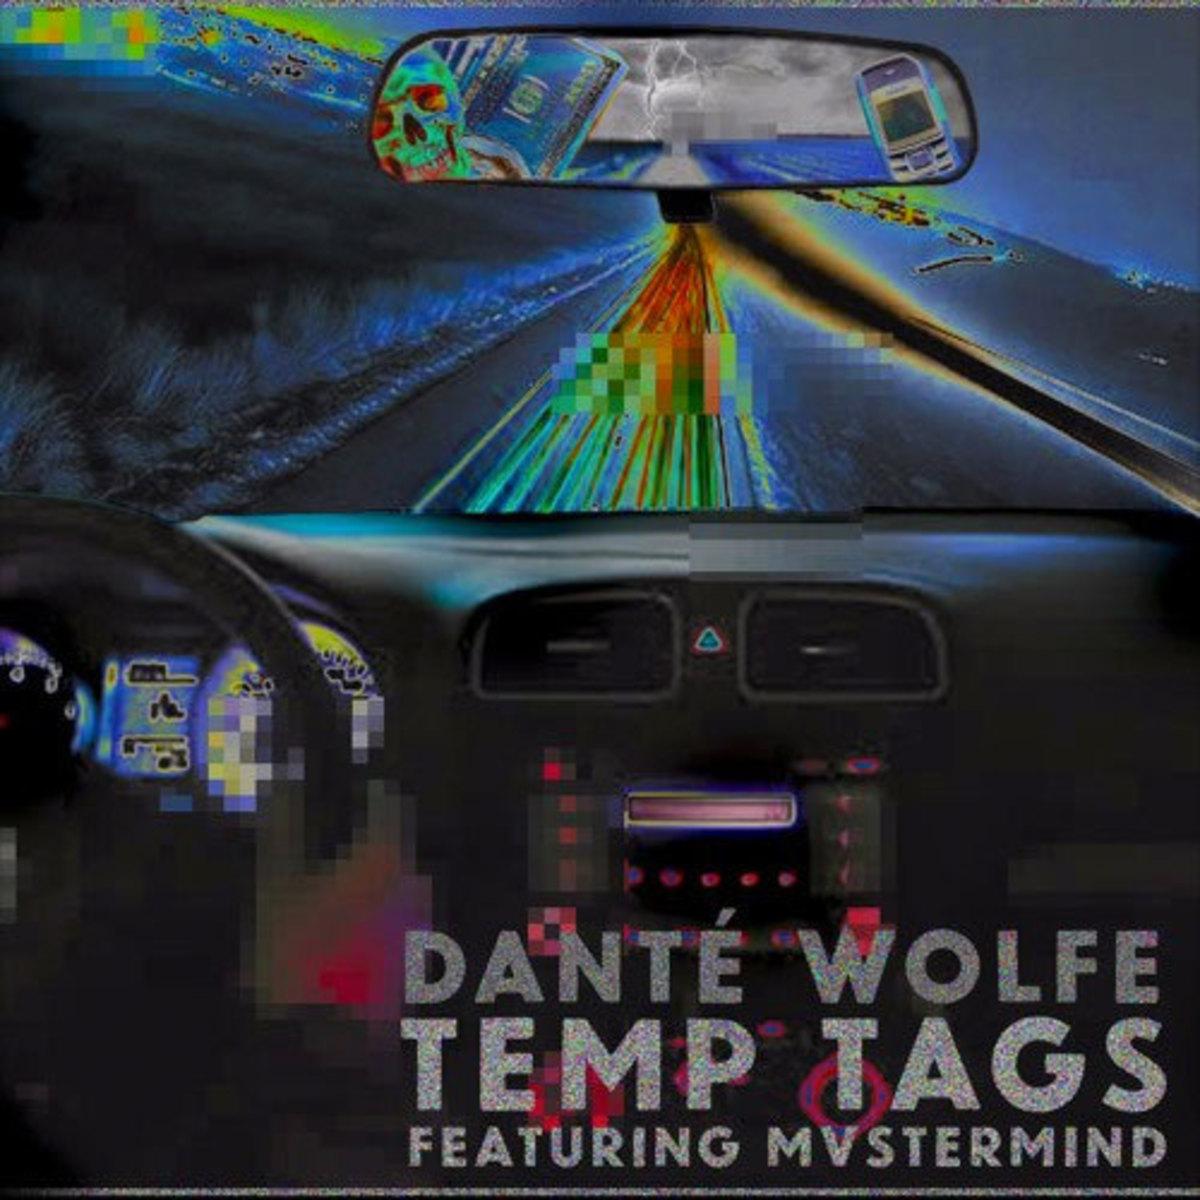 dante-wolfe-temp-tags.jpg